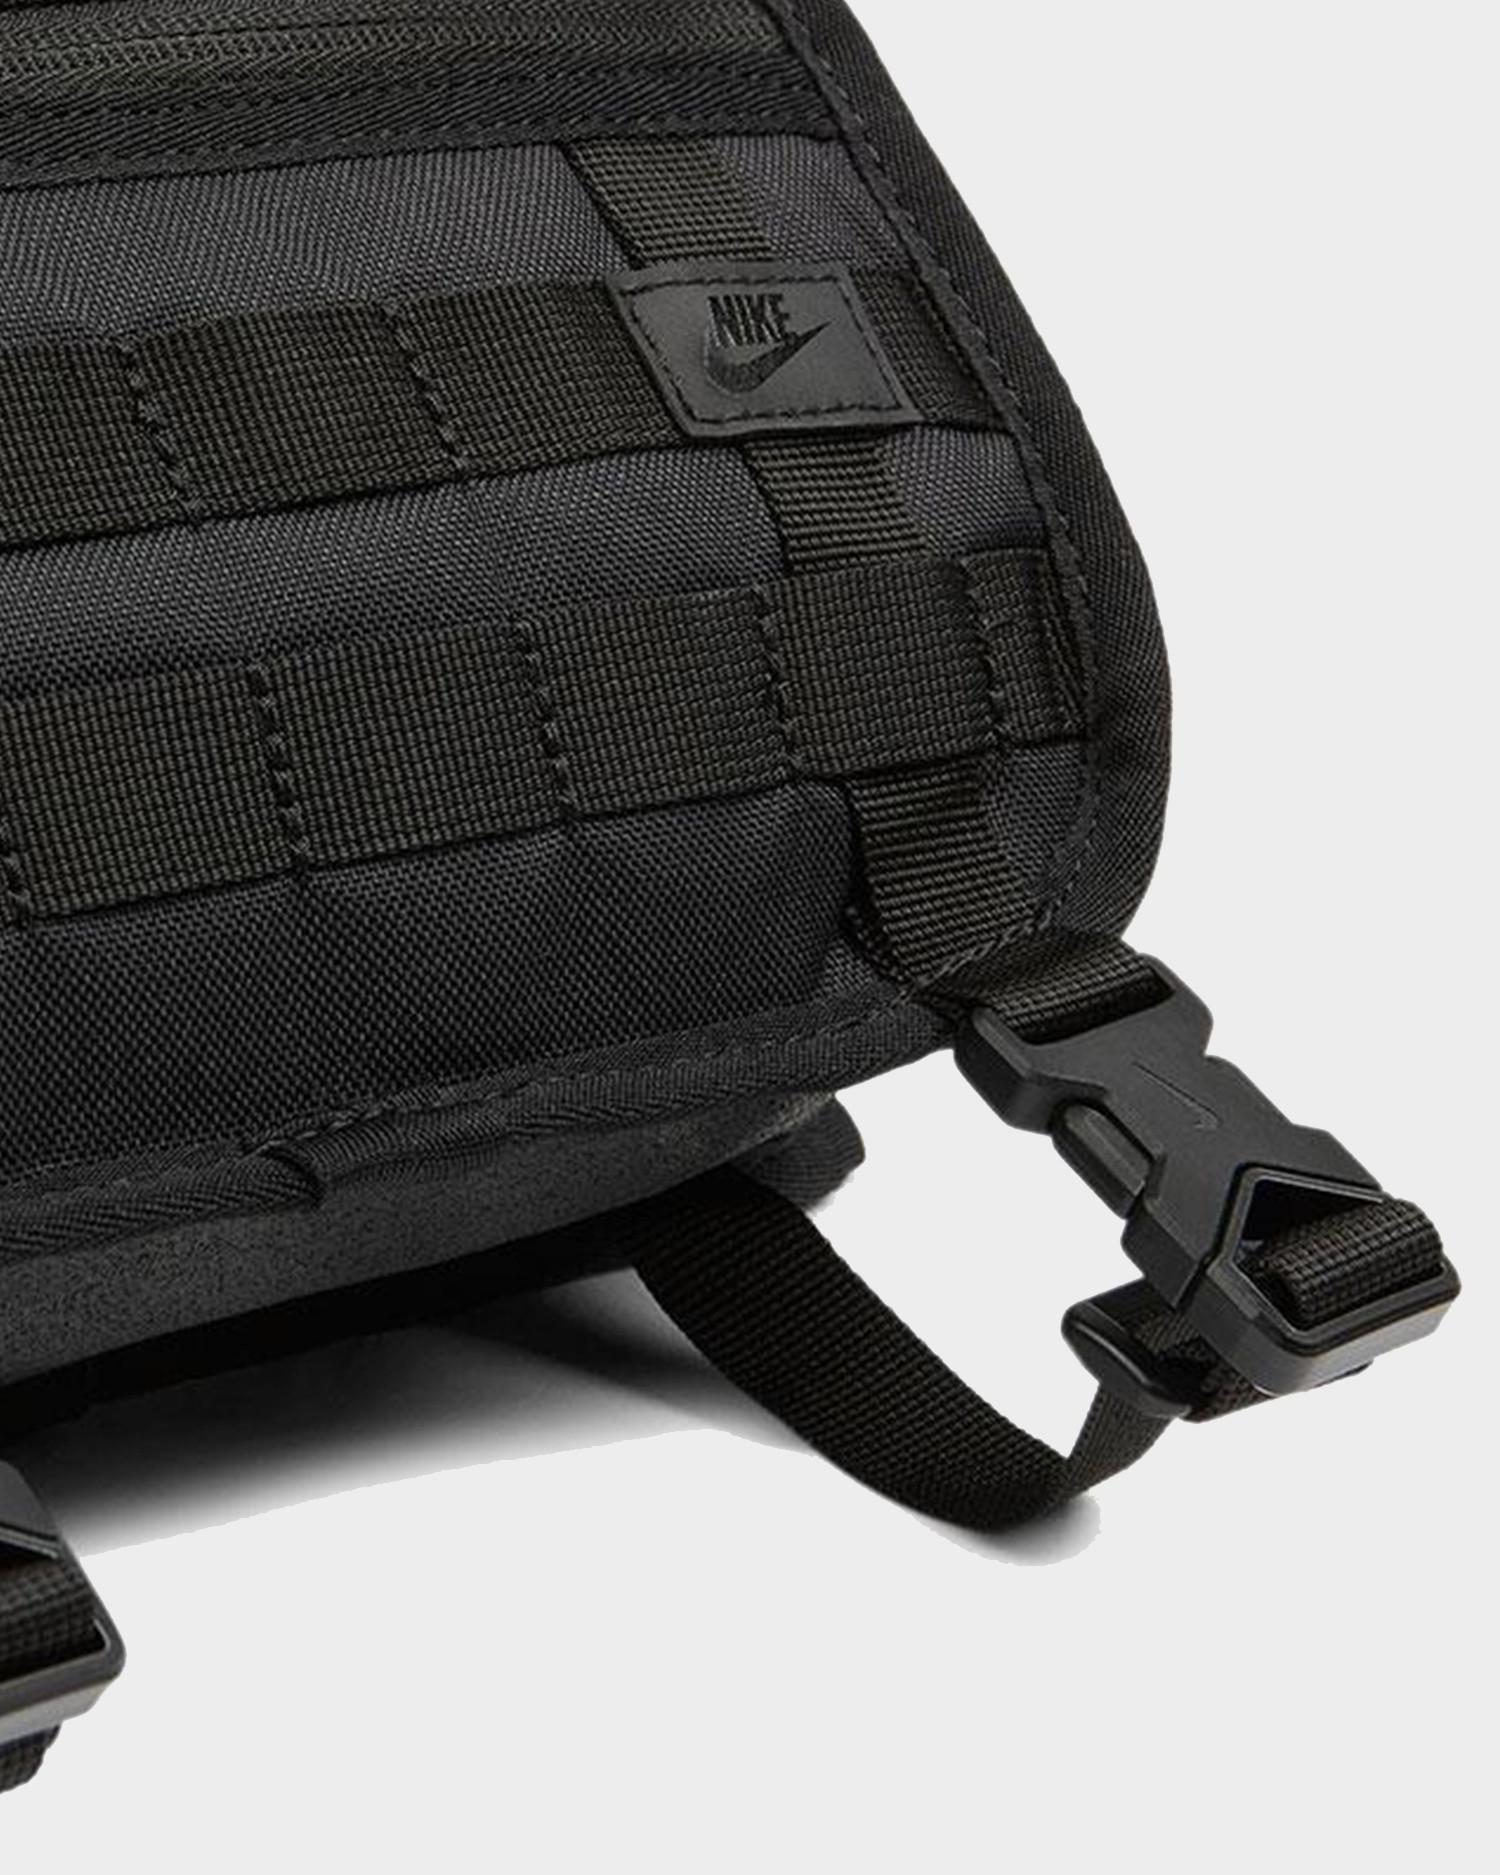 Nike Sportwear Waistpack Black/Black/Black